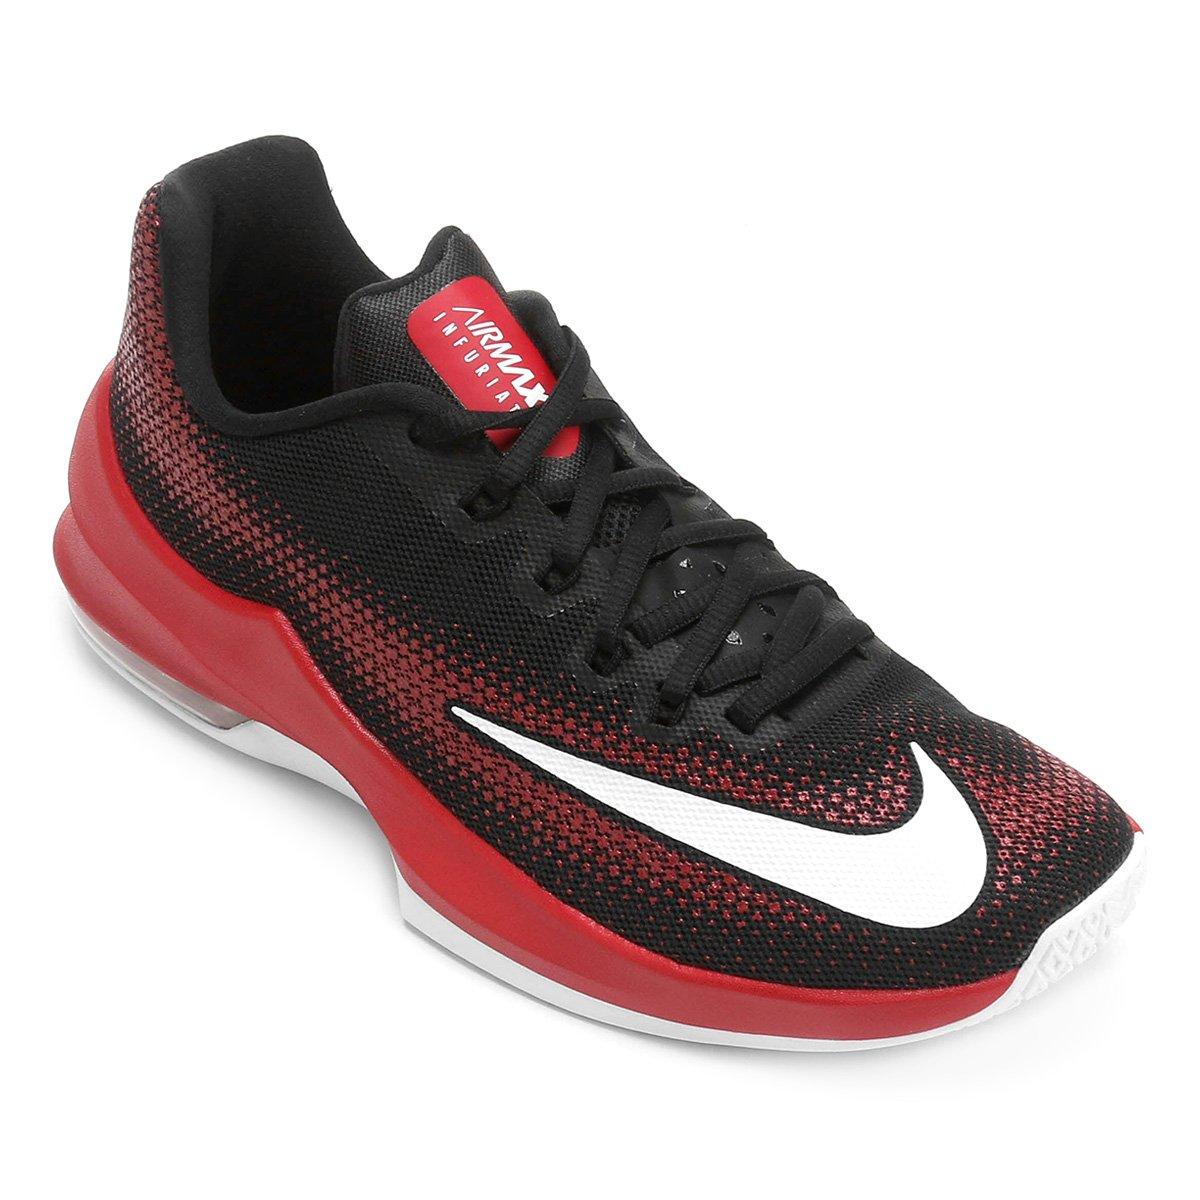 53ca4583d8 Tênis Nike Air Max Infuriate Low Masculino - Preto e Vermelho ...